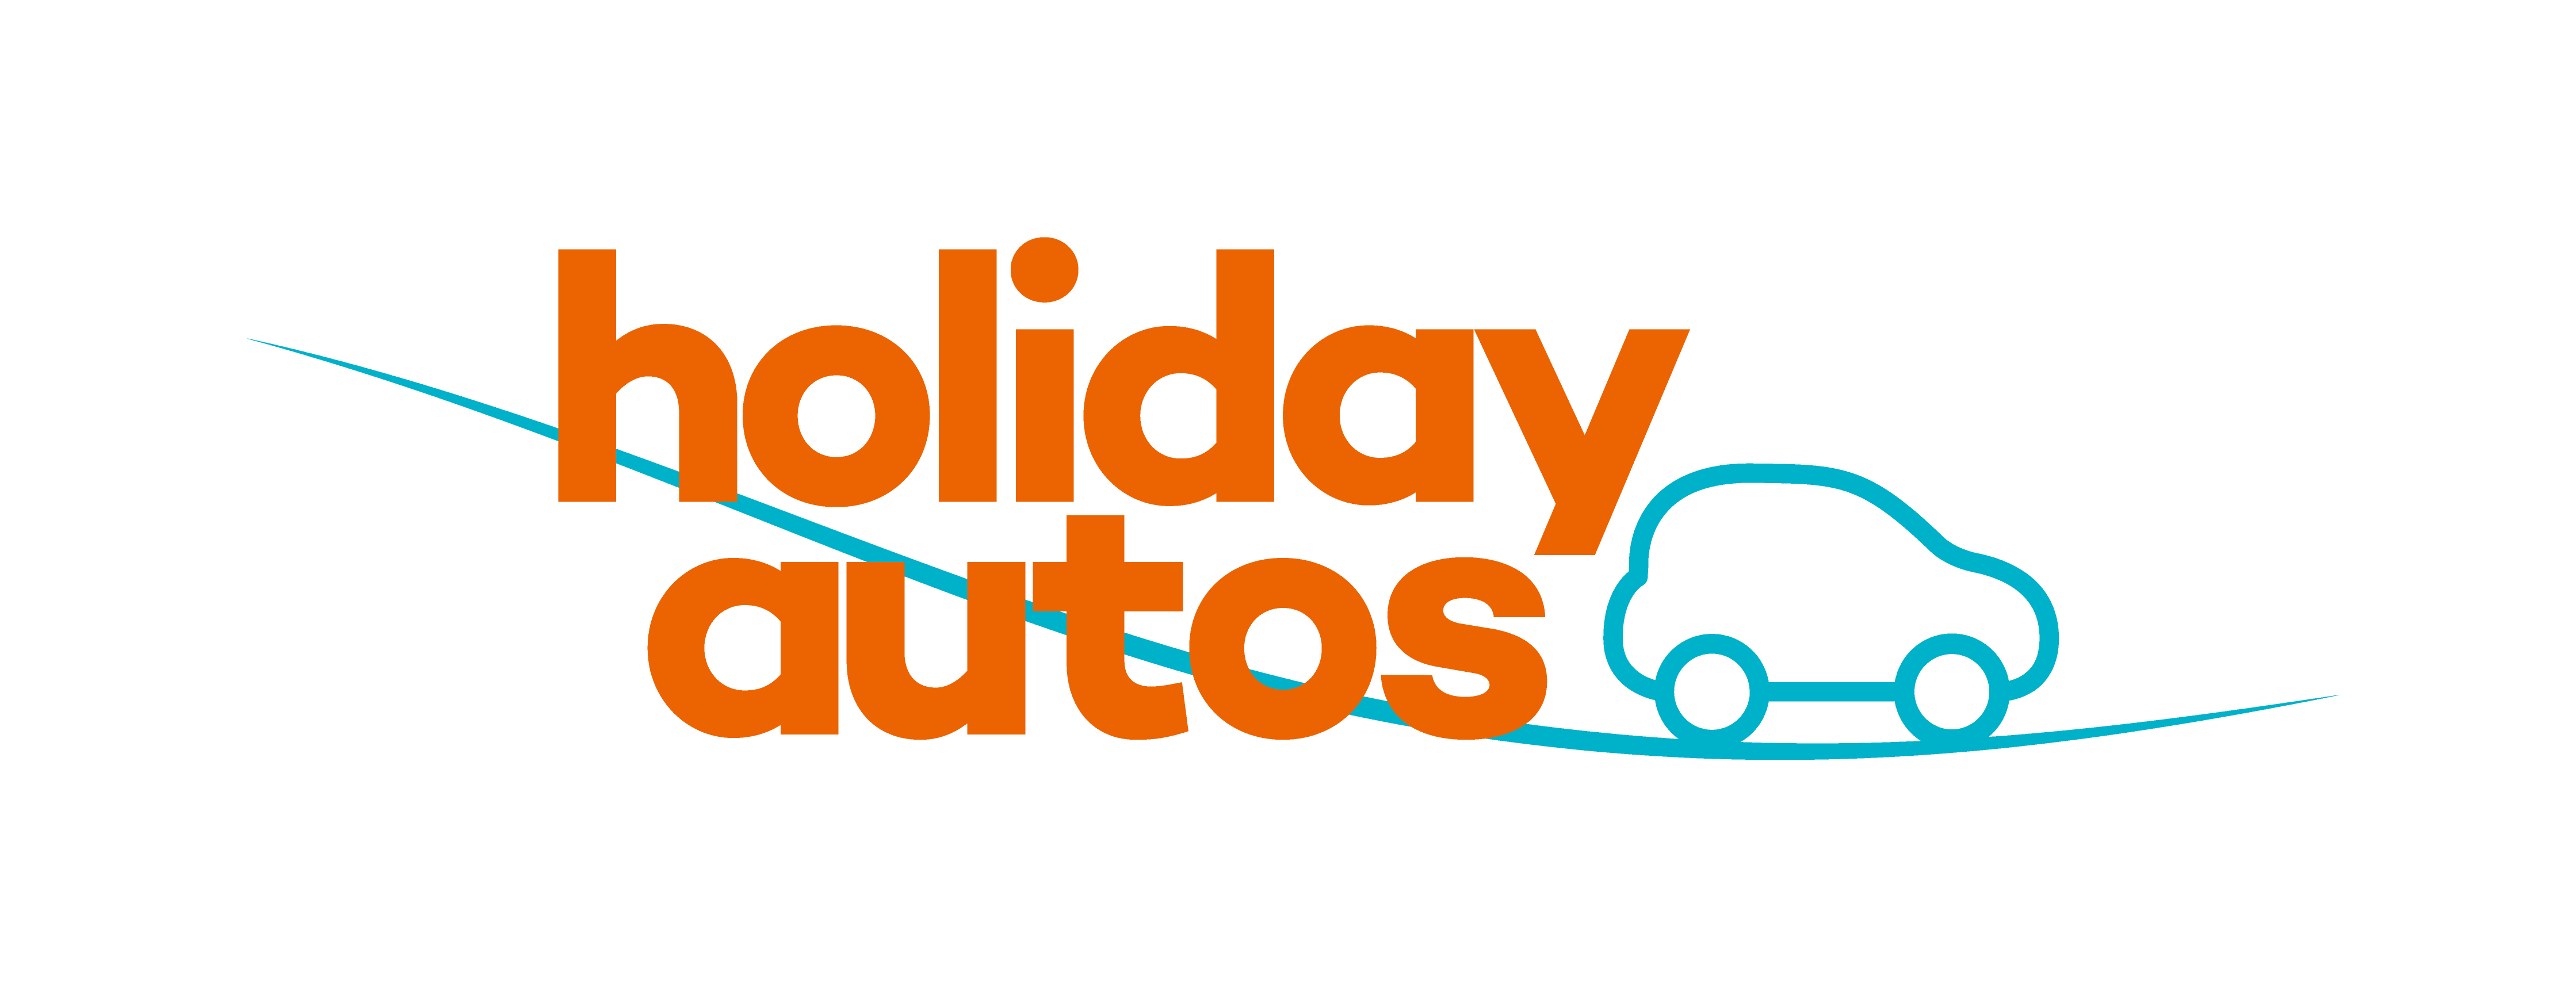 https://3xedigital.com/wp-content/uploads/2018/08/Holiday-Autos.png